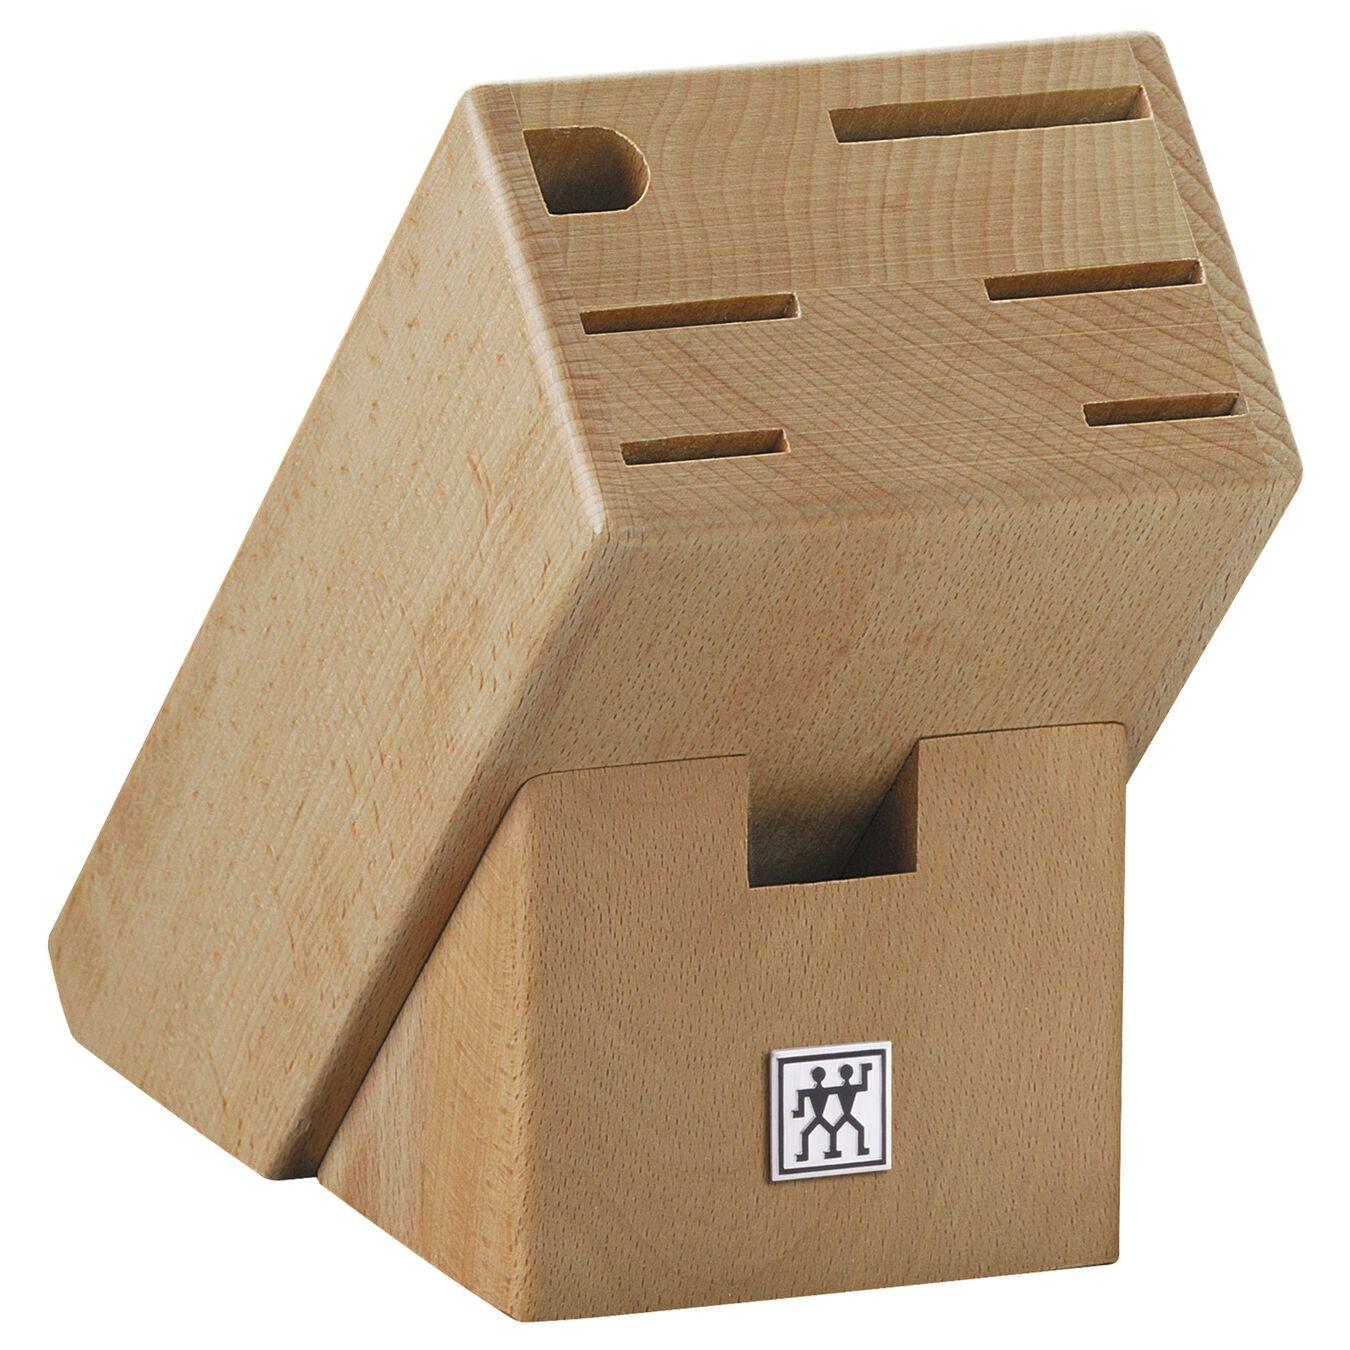 Blok Bıçak Seti | Özel Formül Çelik | 8-parça,,large 9